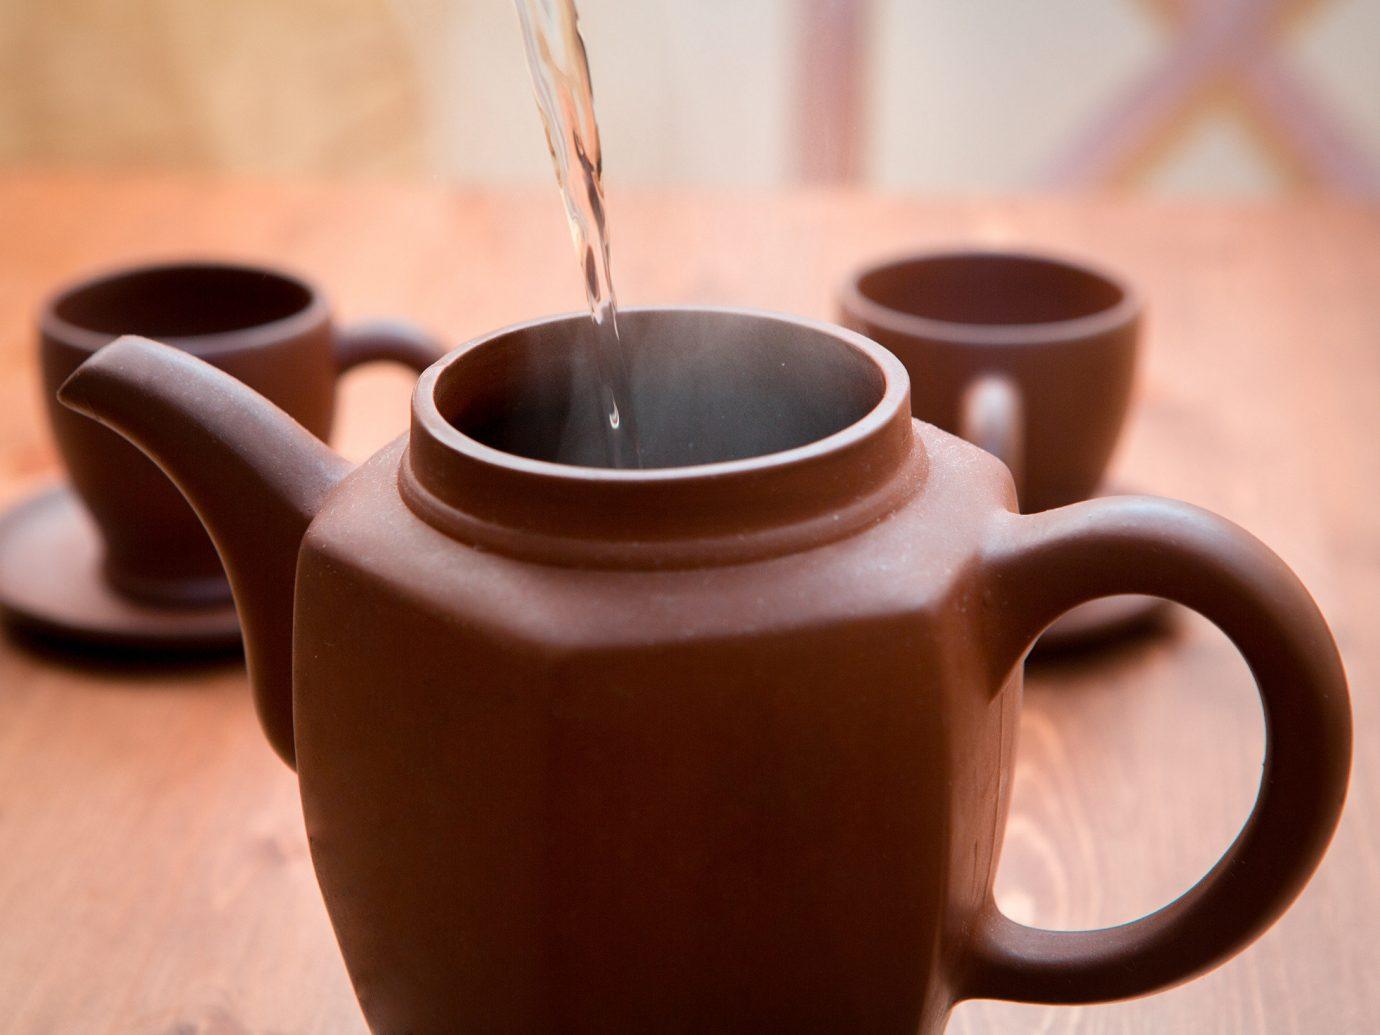 Trip Ideas cup coffee indoor coffee cup Drink teapot morning ceramic art caffeine beverage drinkware tea espresso